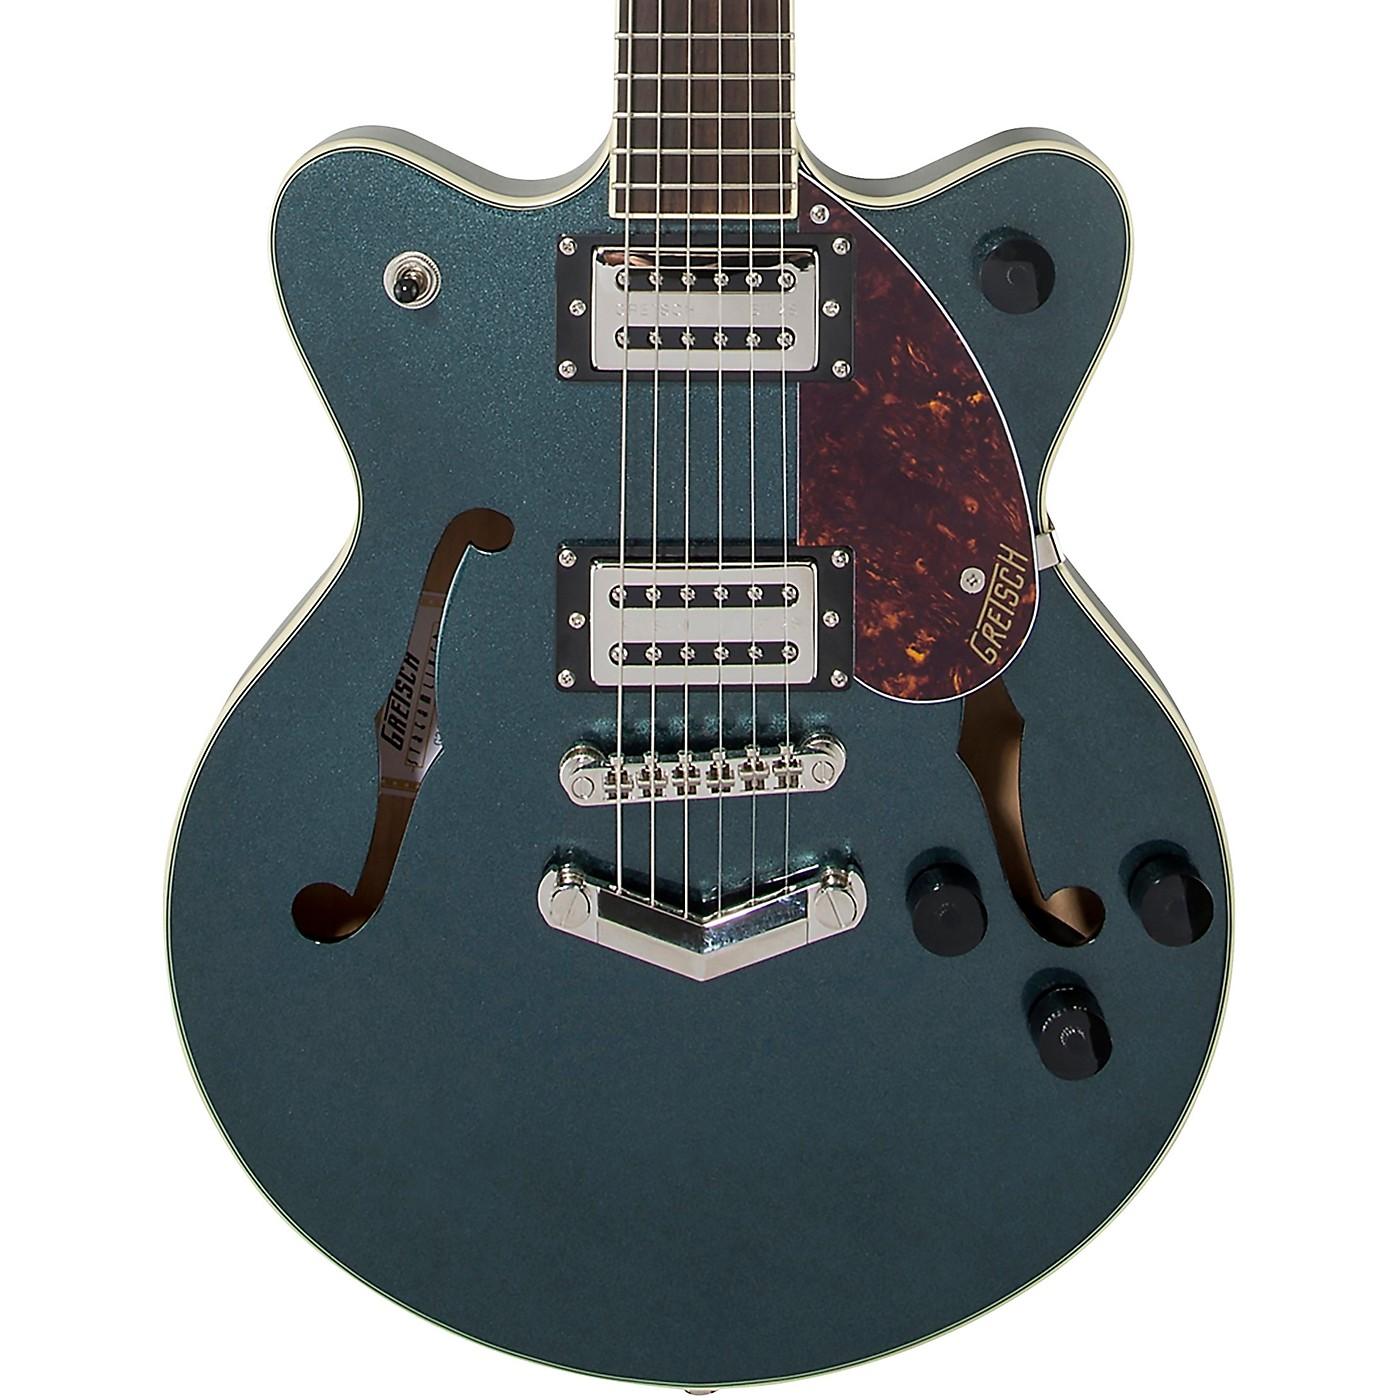 Gretsch Guitars G2655 Streamliner Center Block Jr. with V-Stoptail Electric Guitar thumbnail